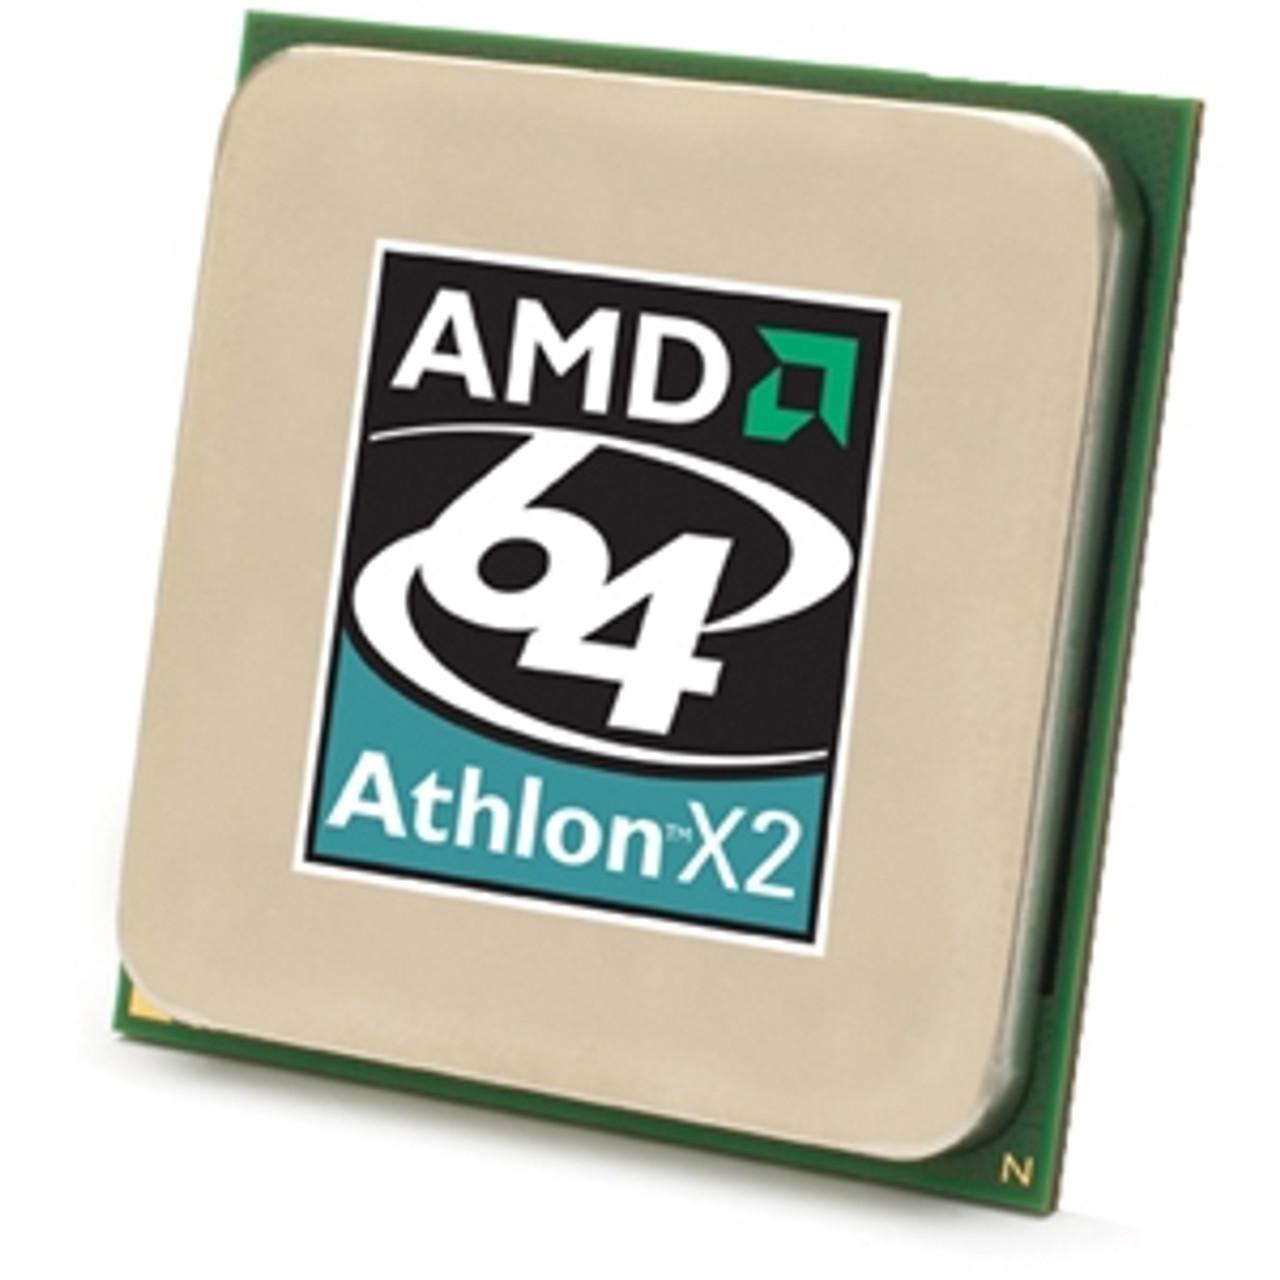 Ado5000iaa5dd Amd Athlon 64 X2 5000 2 6ghz Desktop Cpu